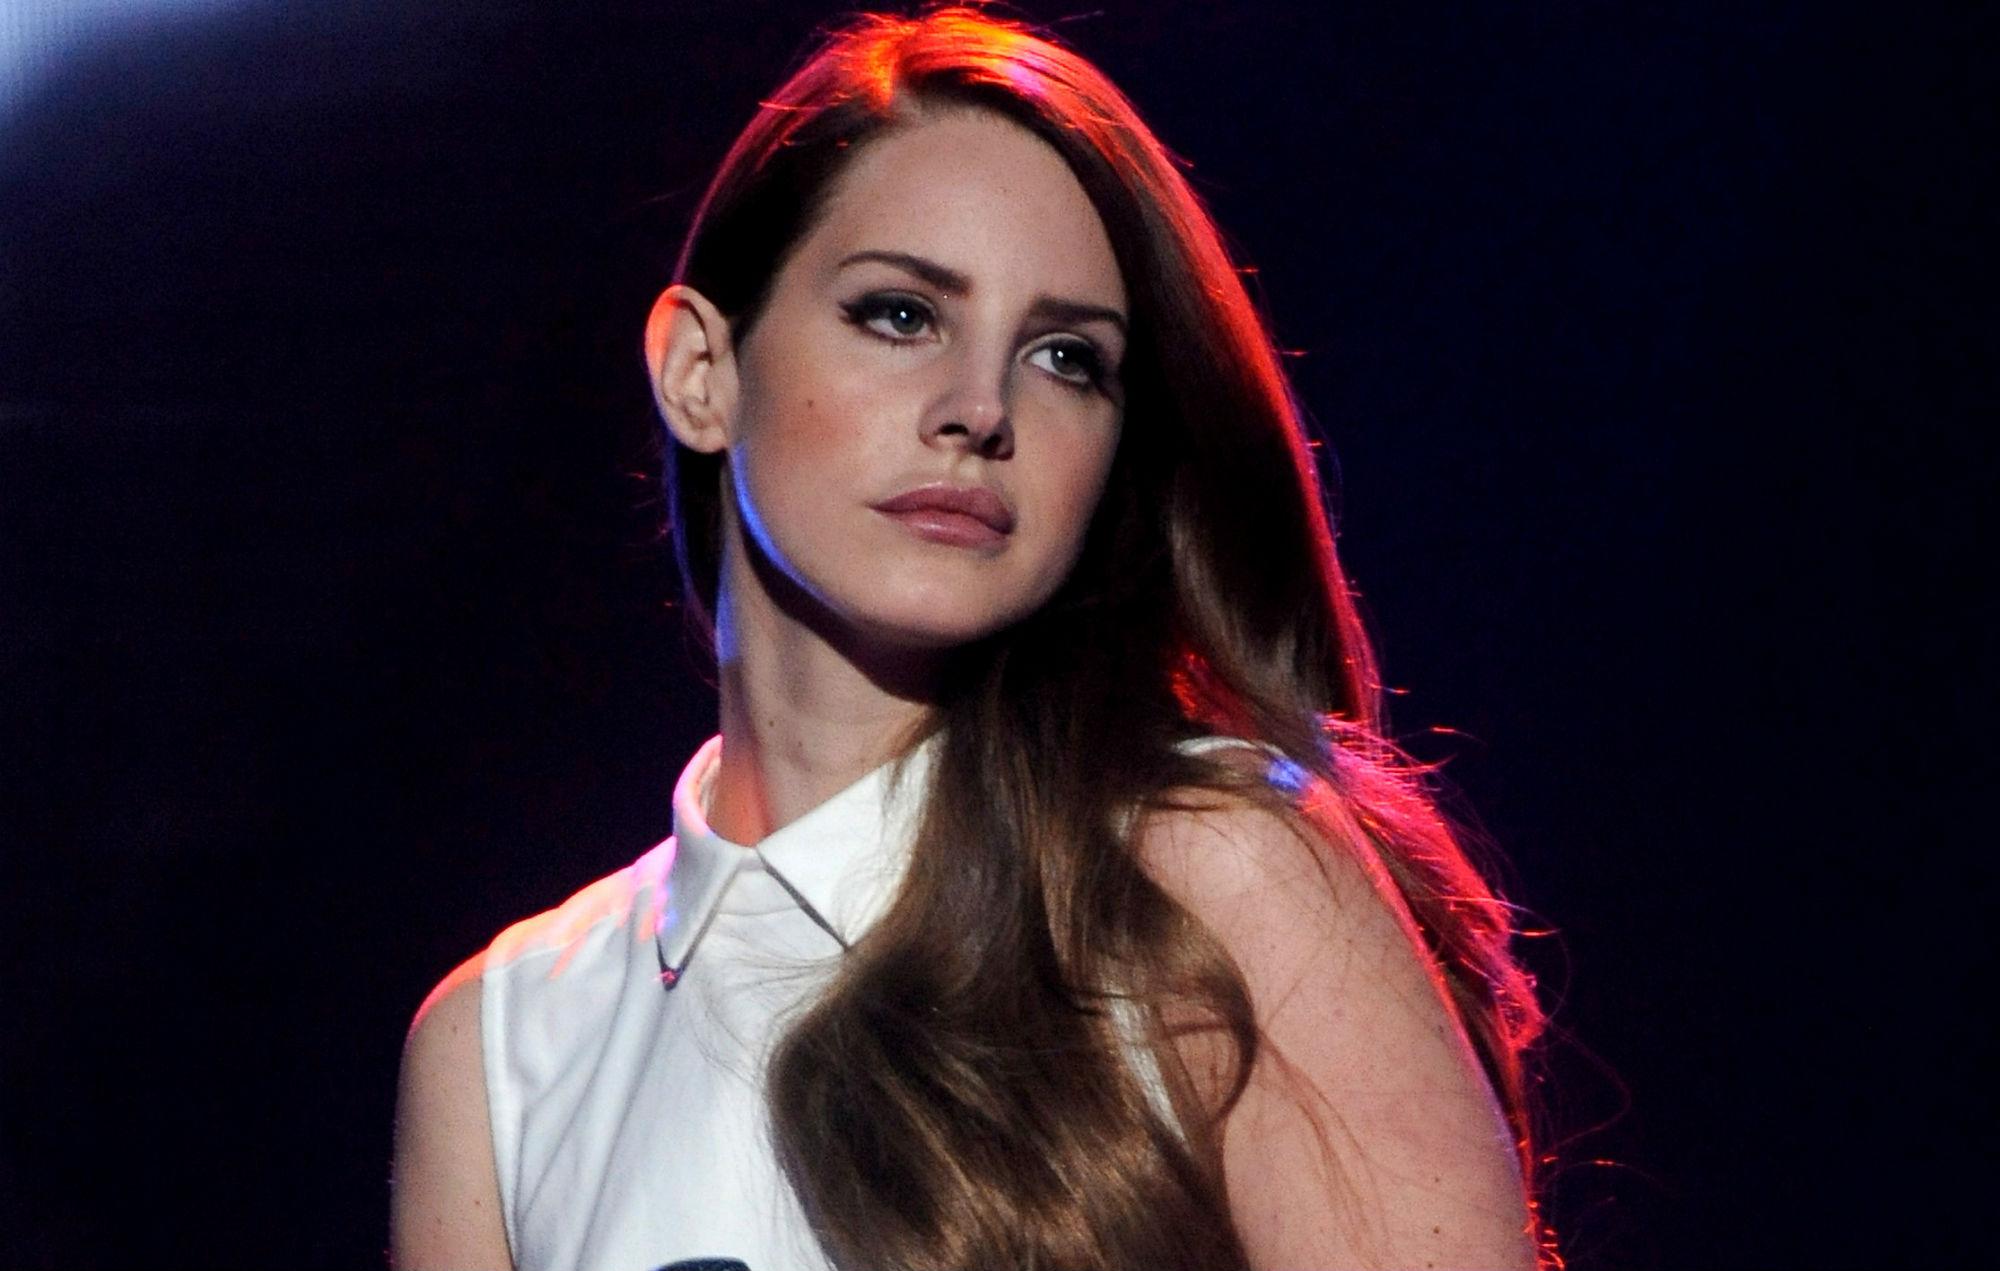 Lana Del Rey Live at the Hollywood Bowl, LA: a poetic genius caught in her natural habitat